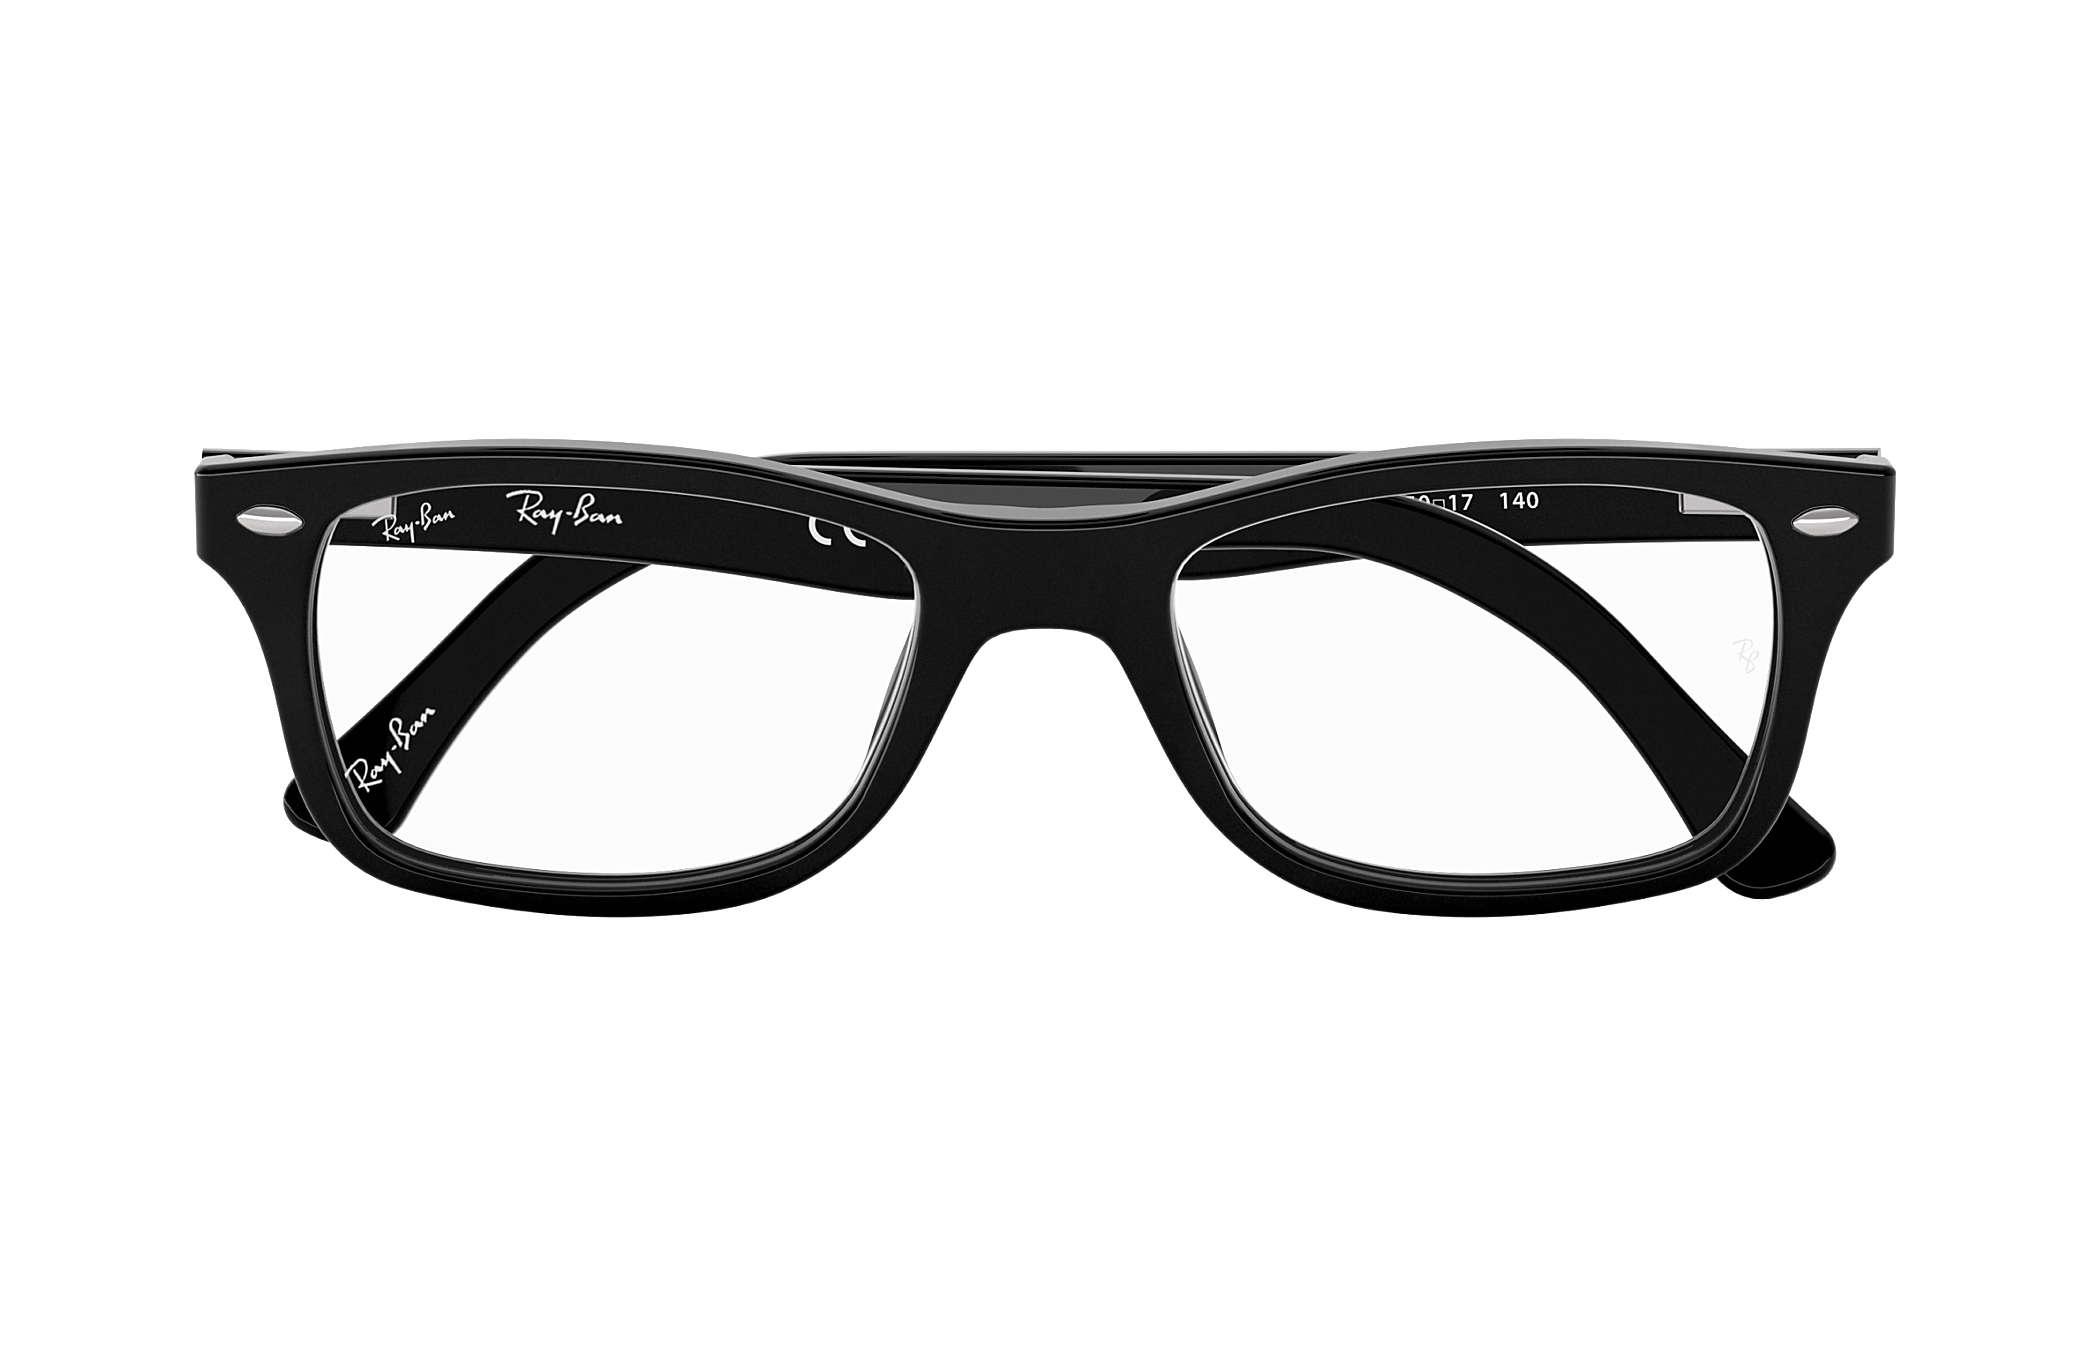 e9cc41866 Óculos de grau Ray-Ban RB5228 Tartaruga - Acetato - 0RX5228201253 ...